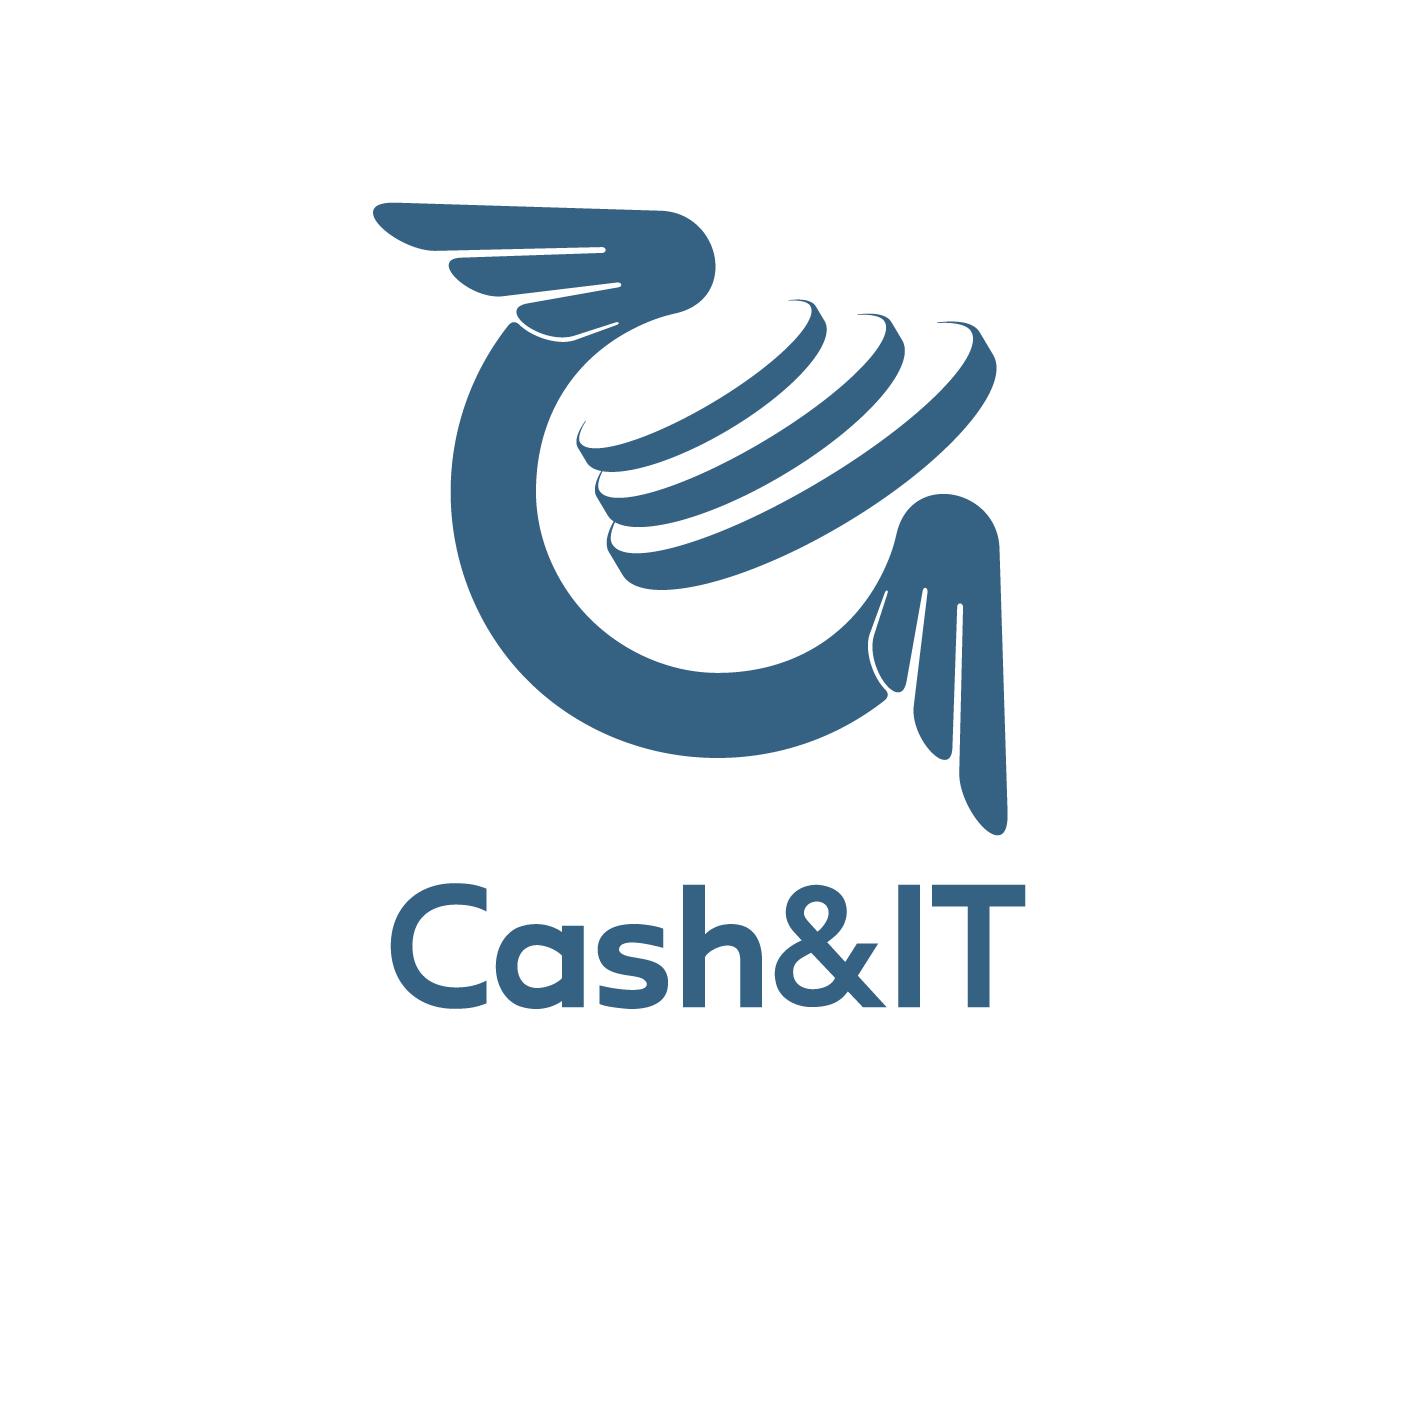 Логотип для Cash & IT - сервис доставки денег фото f_4945fd8ac65b06b8.png